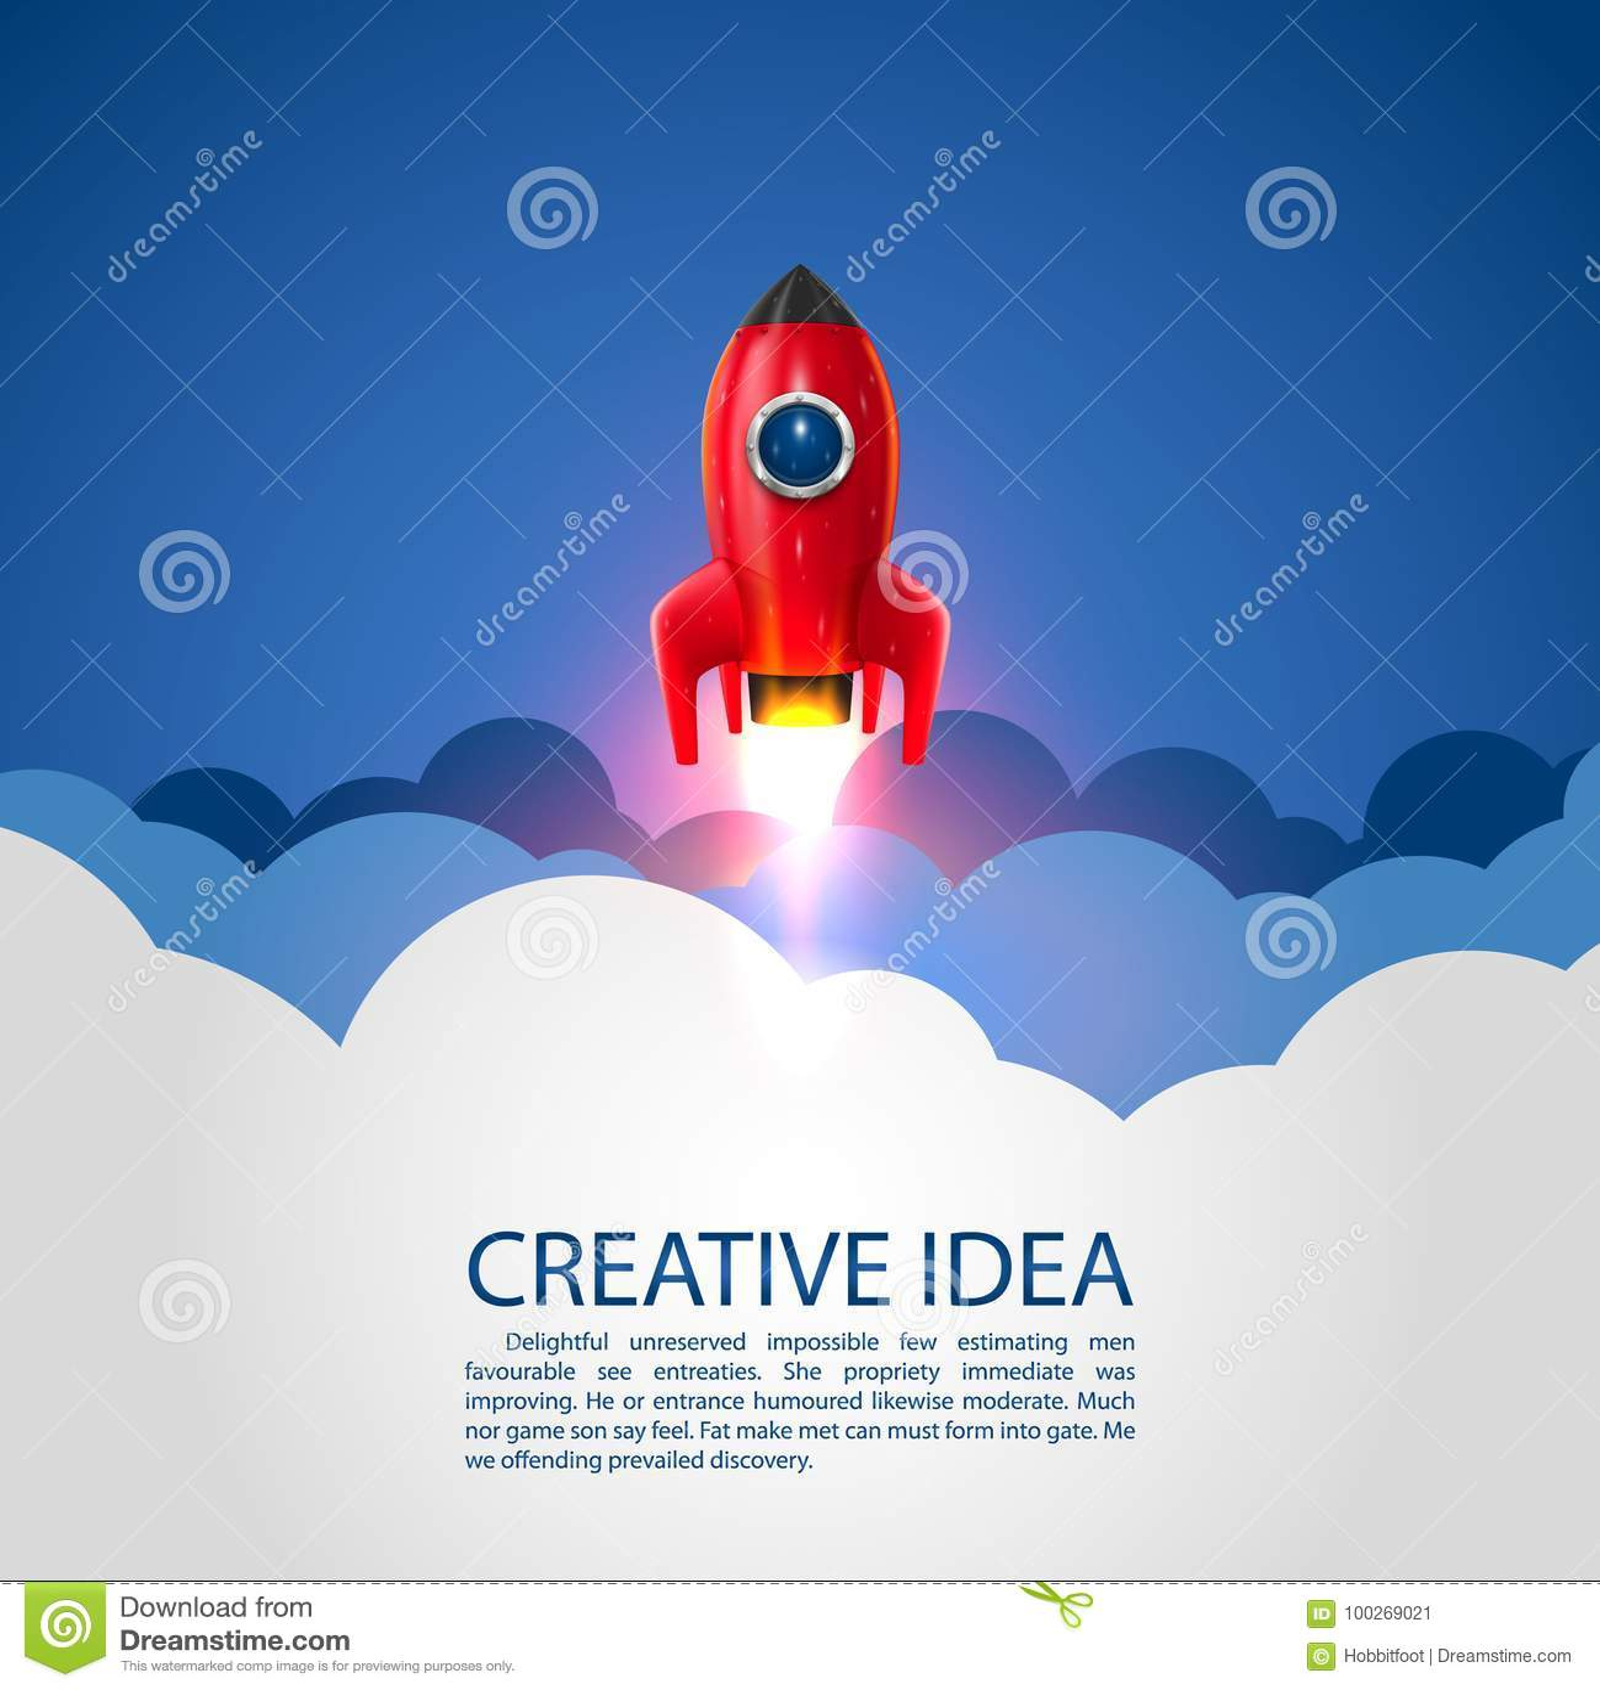 Space rocket launch, Startup creative idea.